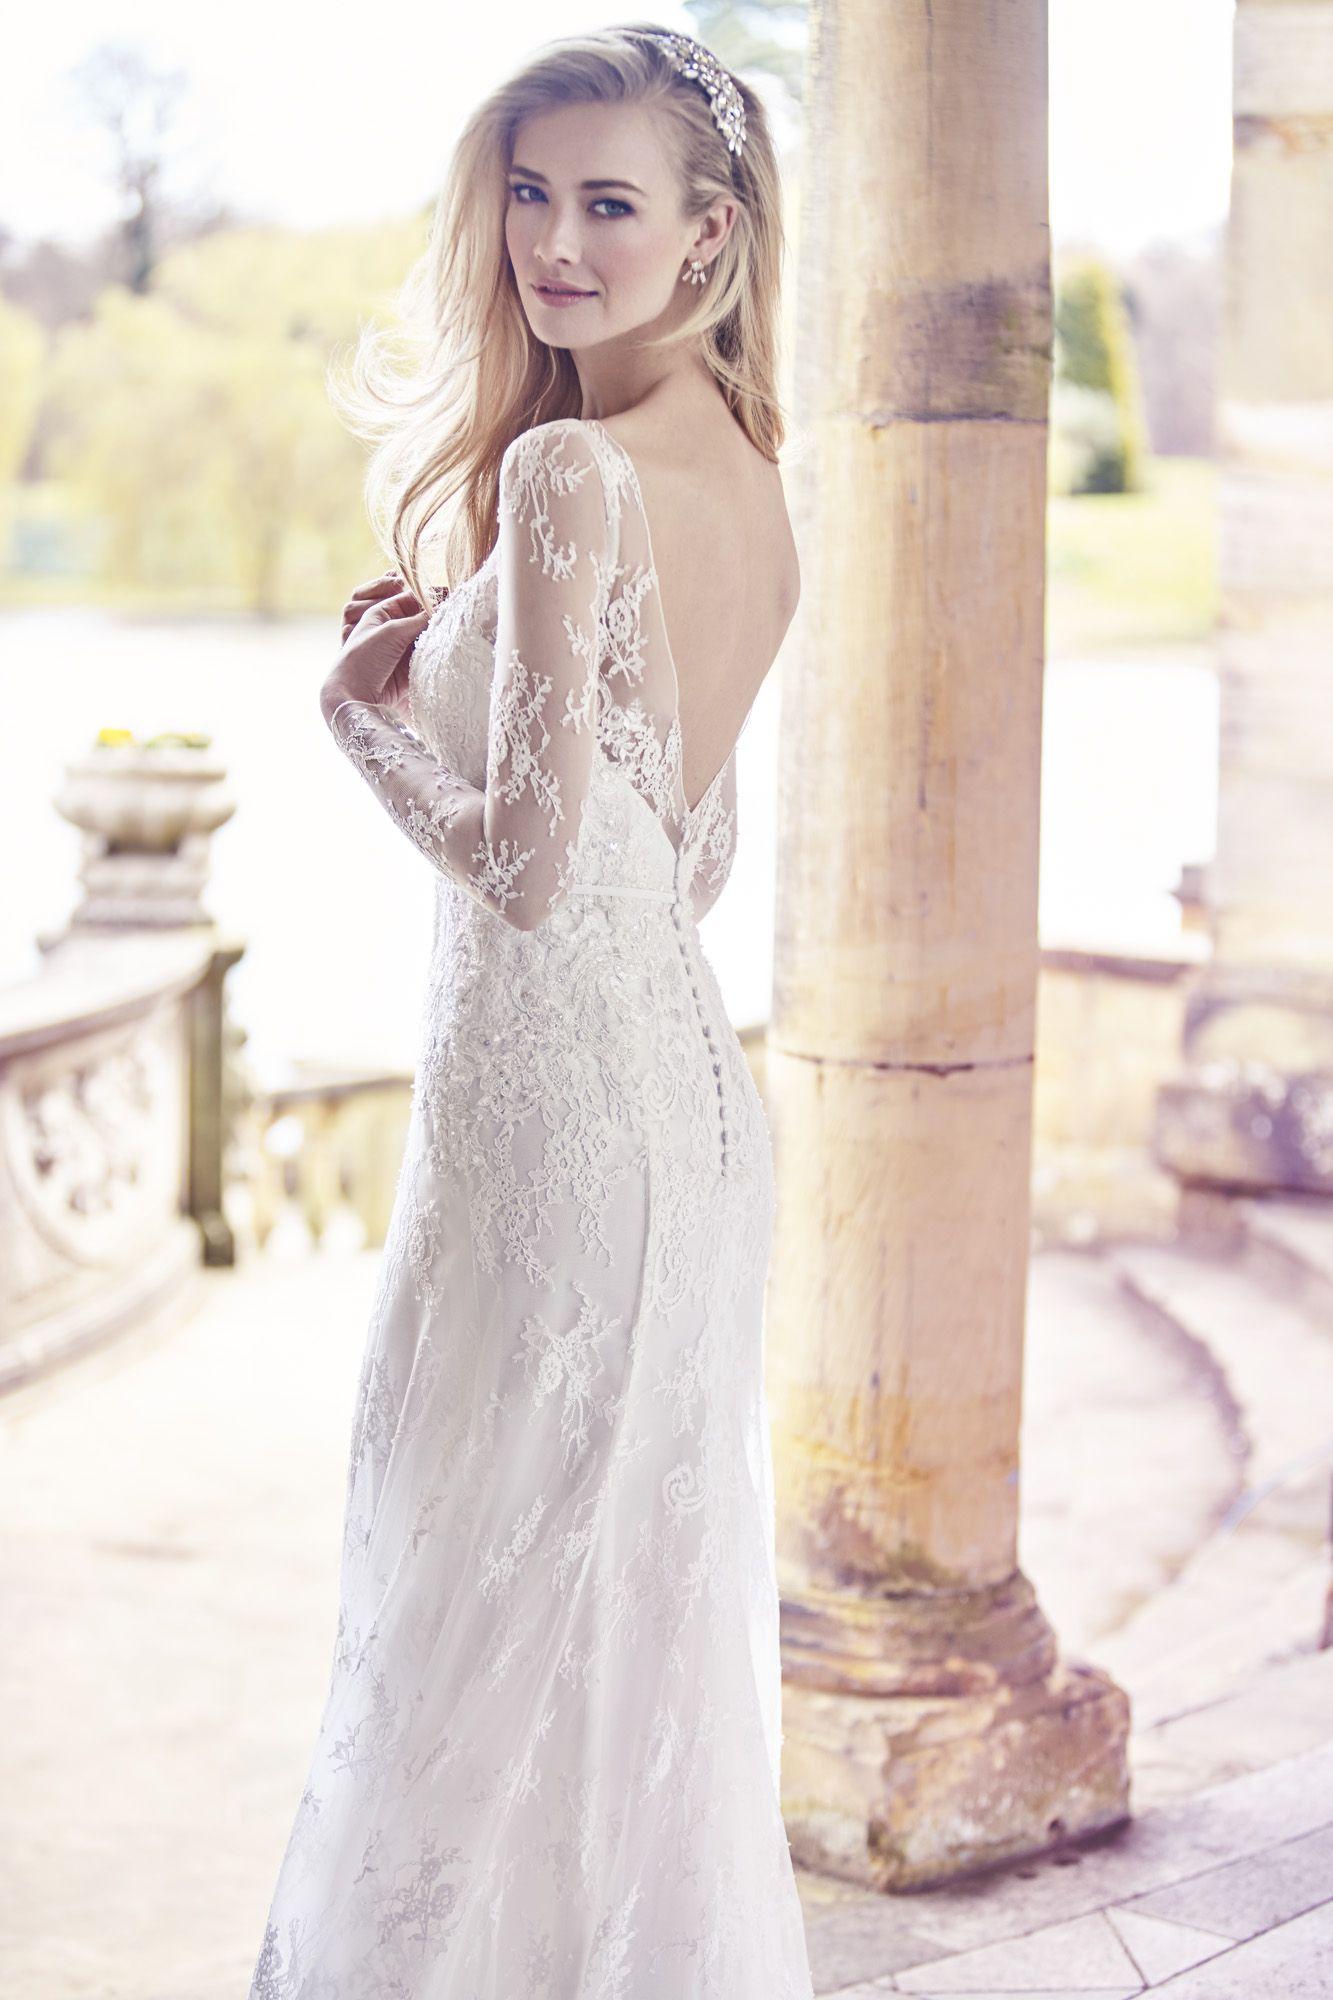 Wedding dress lace sleeves  Ellis Bridals weddingdresses bridal lace sleeves  The Sleeved